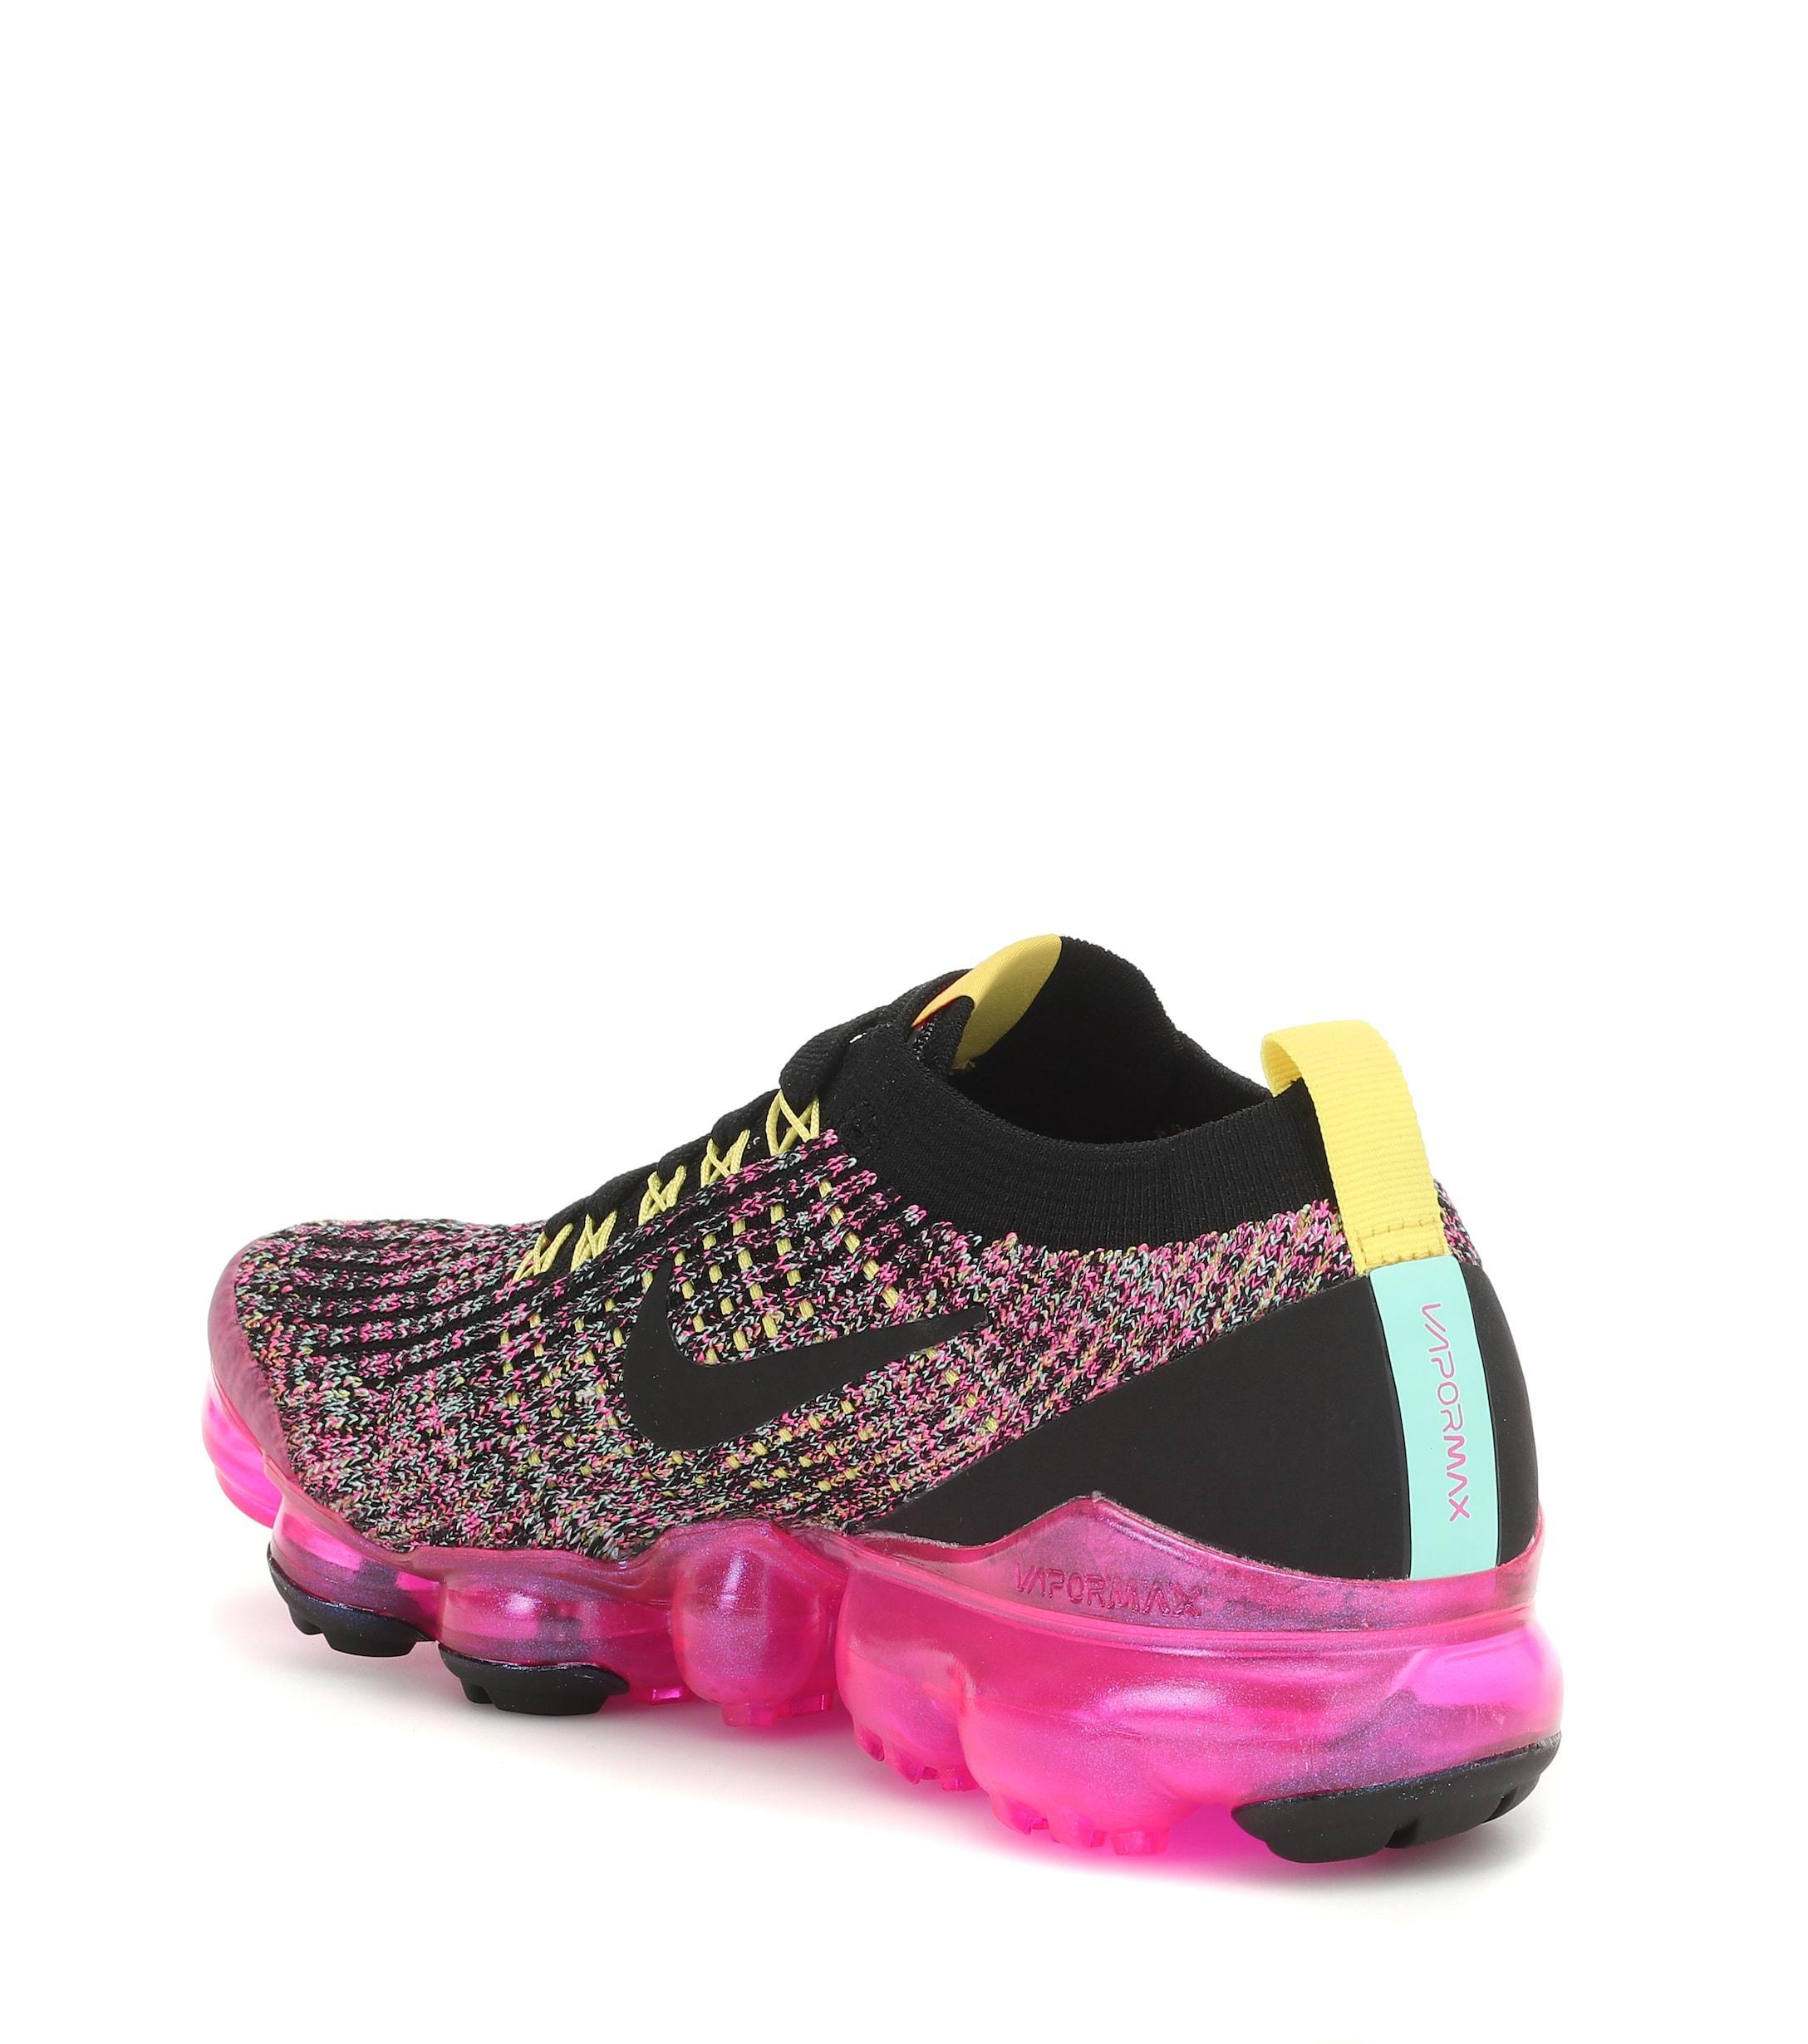 Zapatillas Air VaporMax Flyknit 3 Nike de Caucho de color Negro